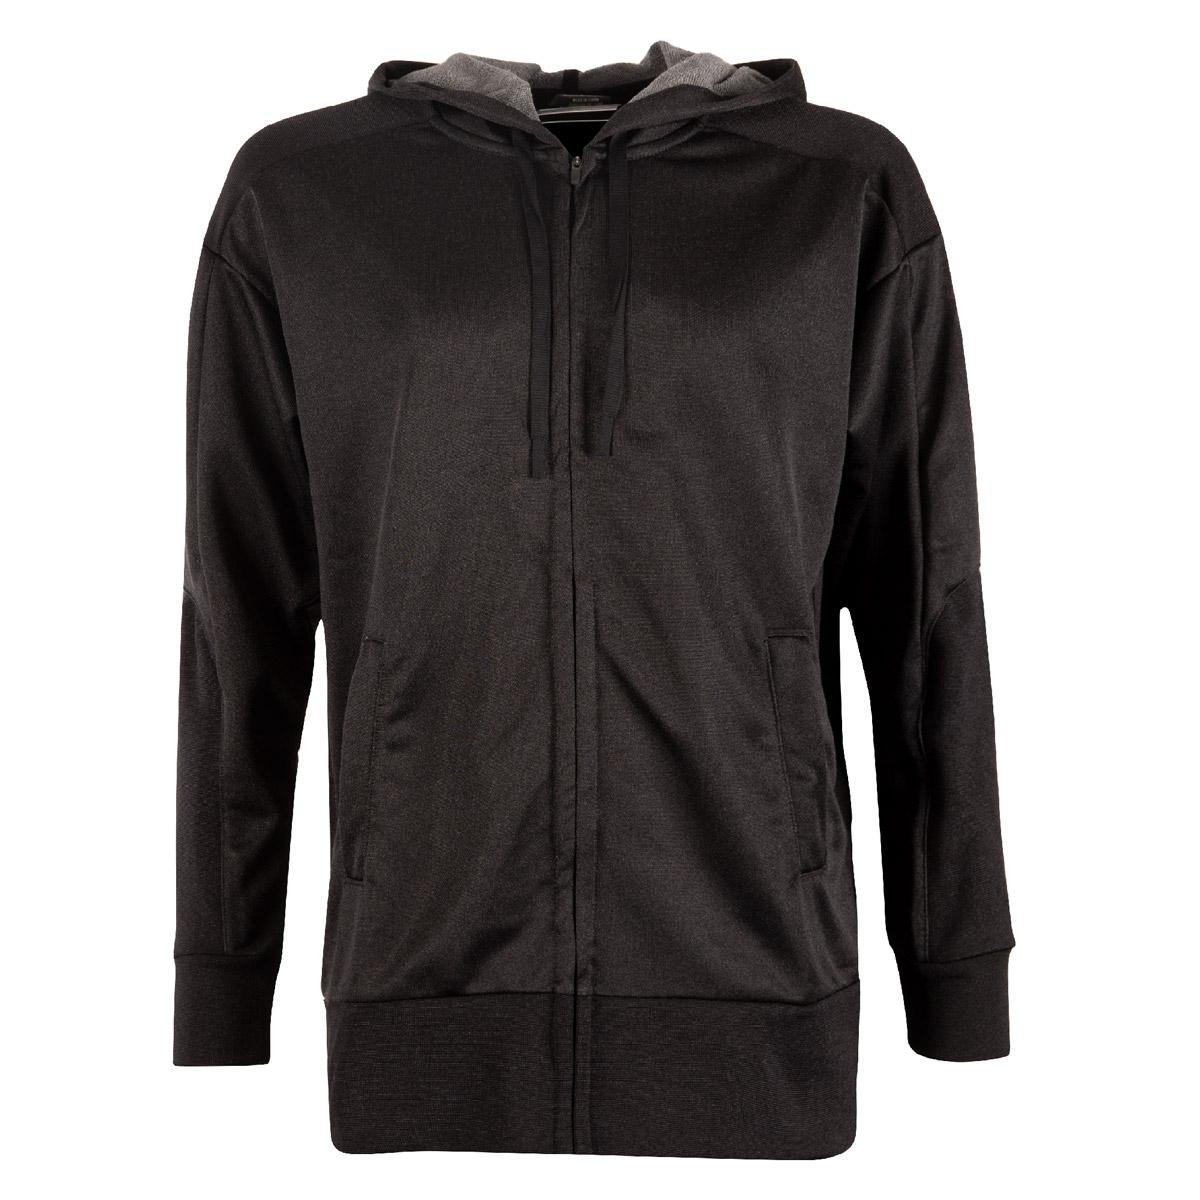 30a11959b7a0 Nike Womens Dri-Fit Full Zip Hoodie Black - Front